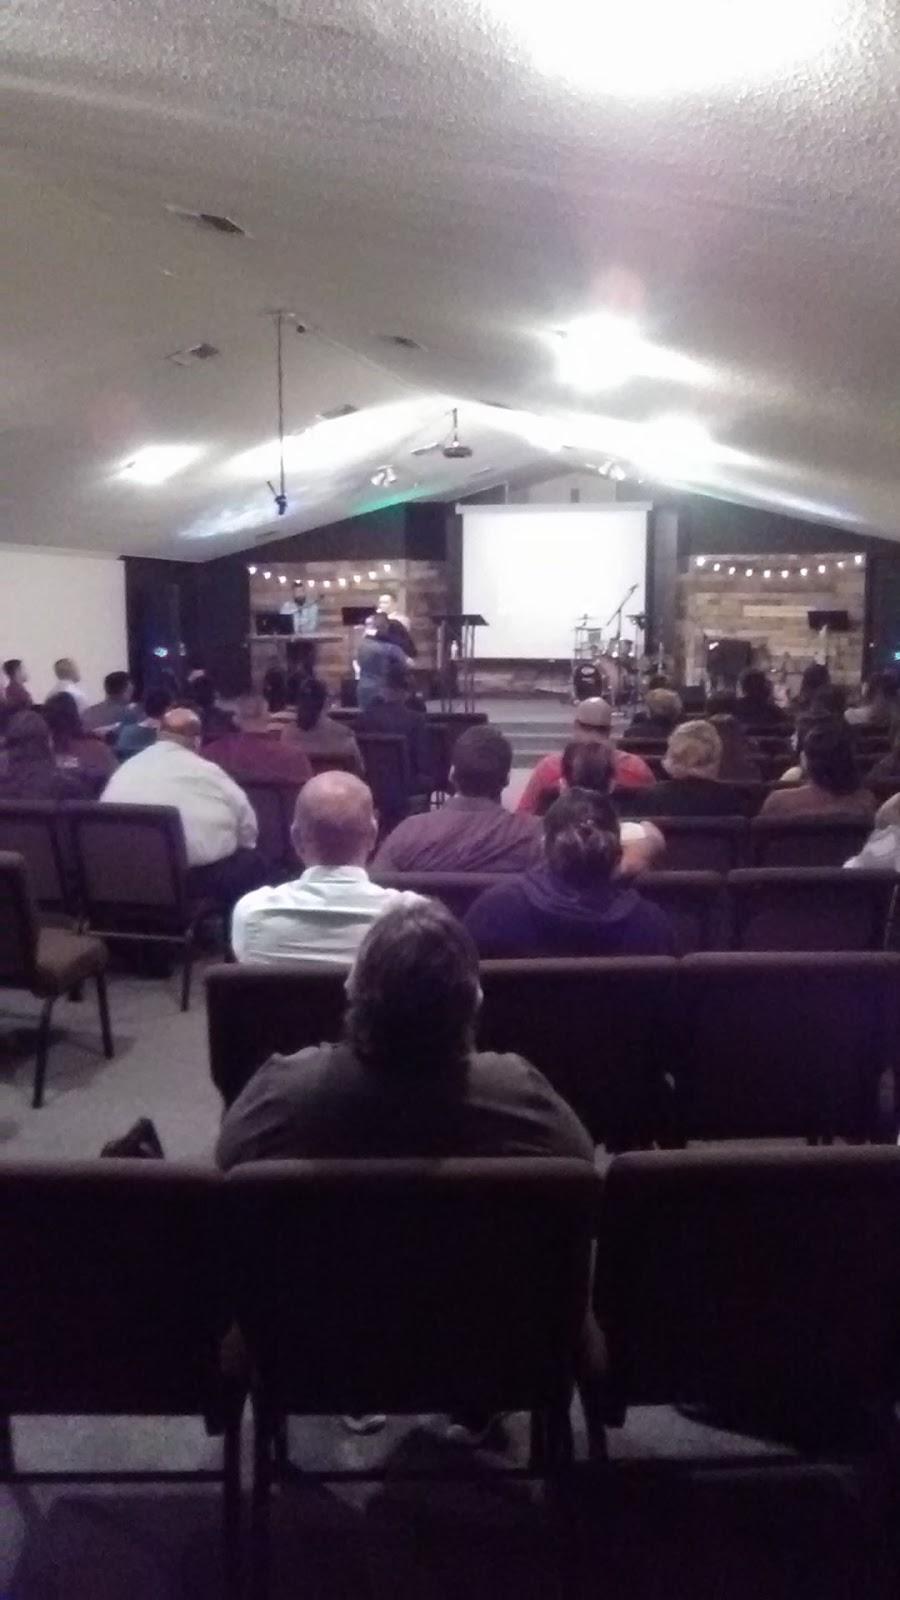 Mt. Zion Revival Center - church  | Photo 5 of 7 | Address: 2106 Jones Rd, Beeville, TX 78102, USA | Phone: (361) 343-5622